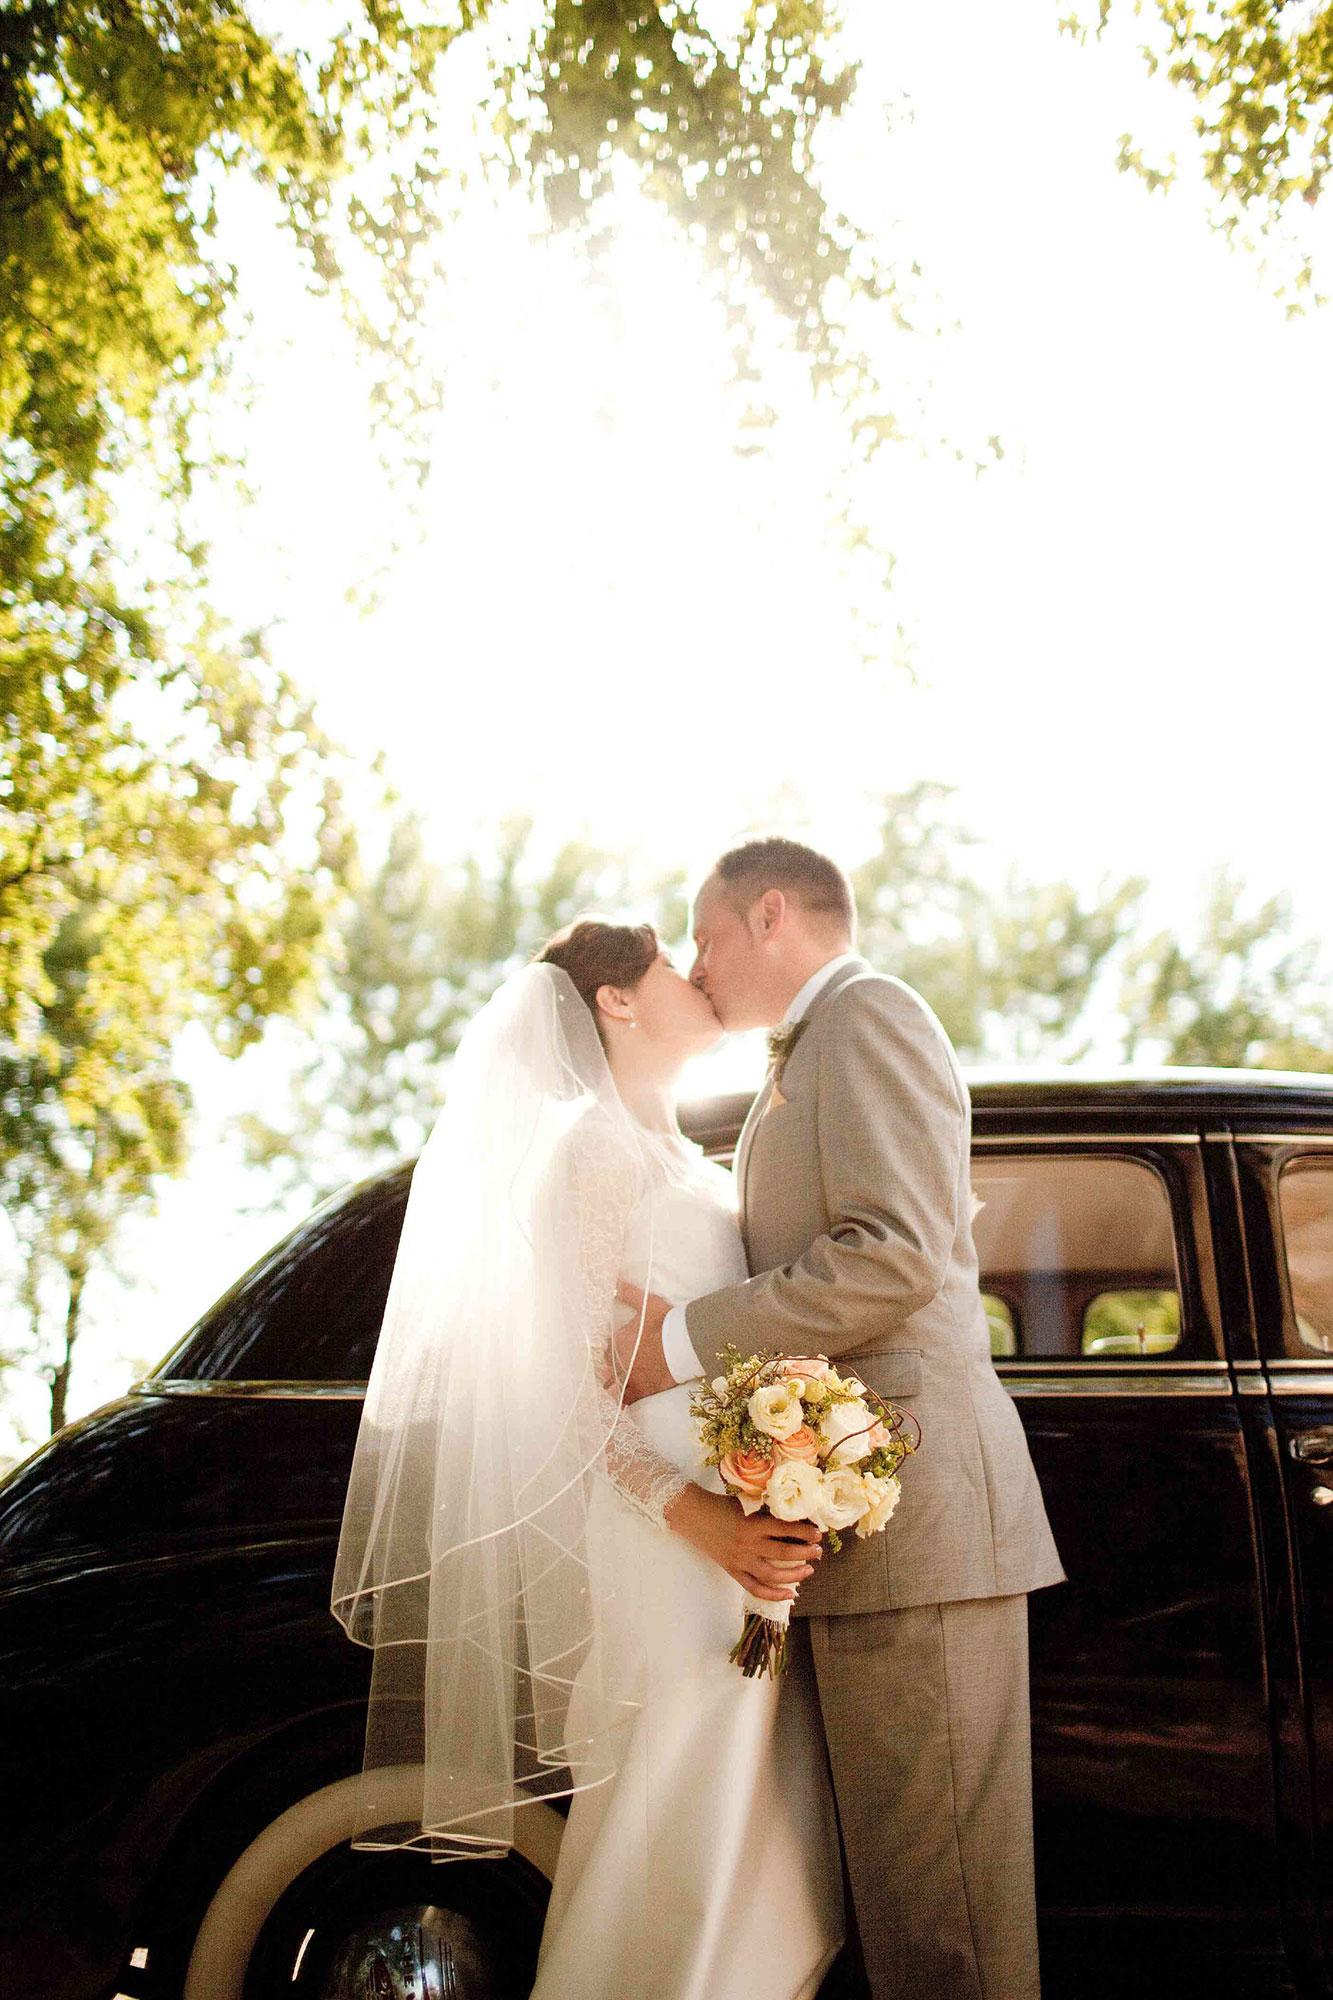 Amanda-Cowley-Willowbank-Vineyard-Bride-Photo-By-White-Photographie-013.jpg